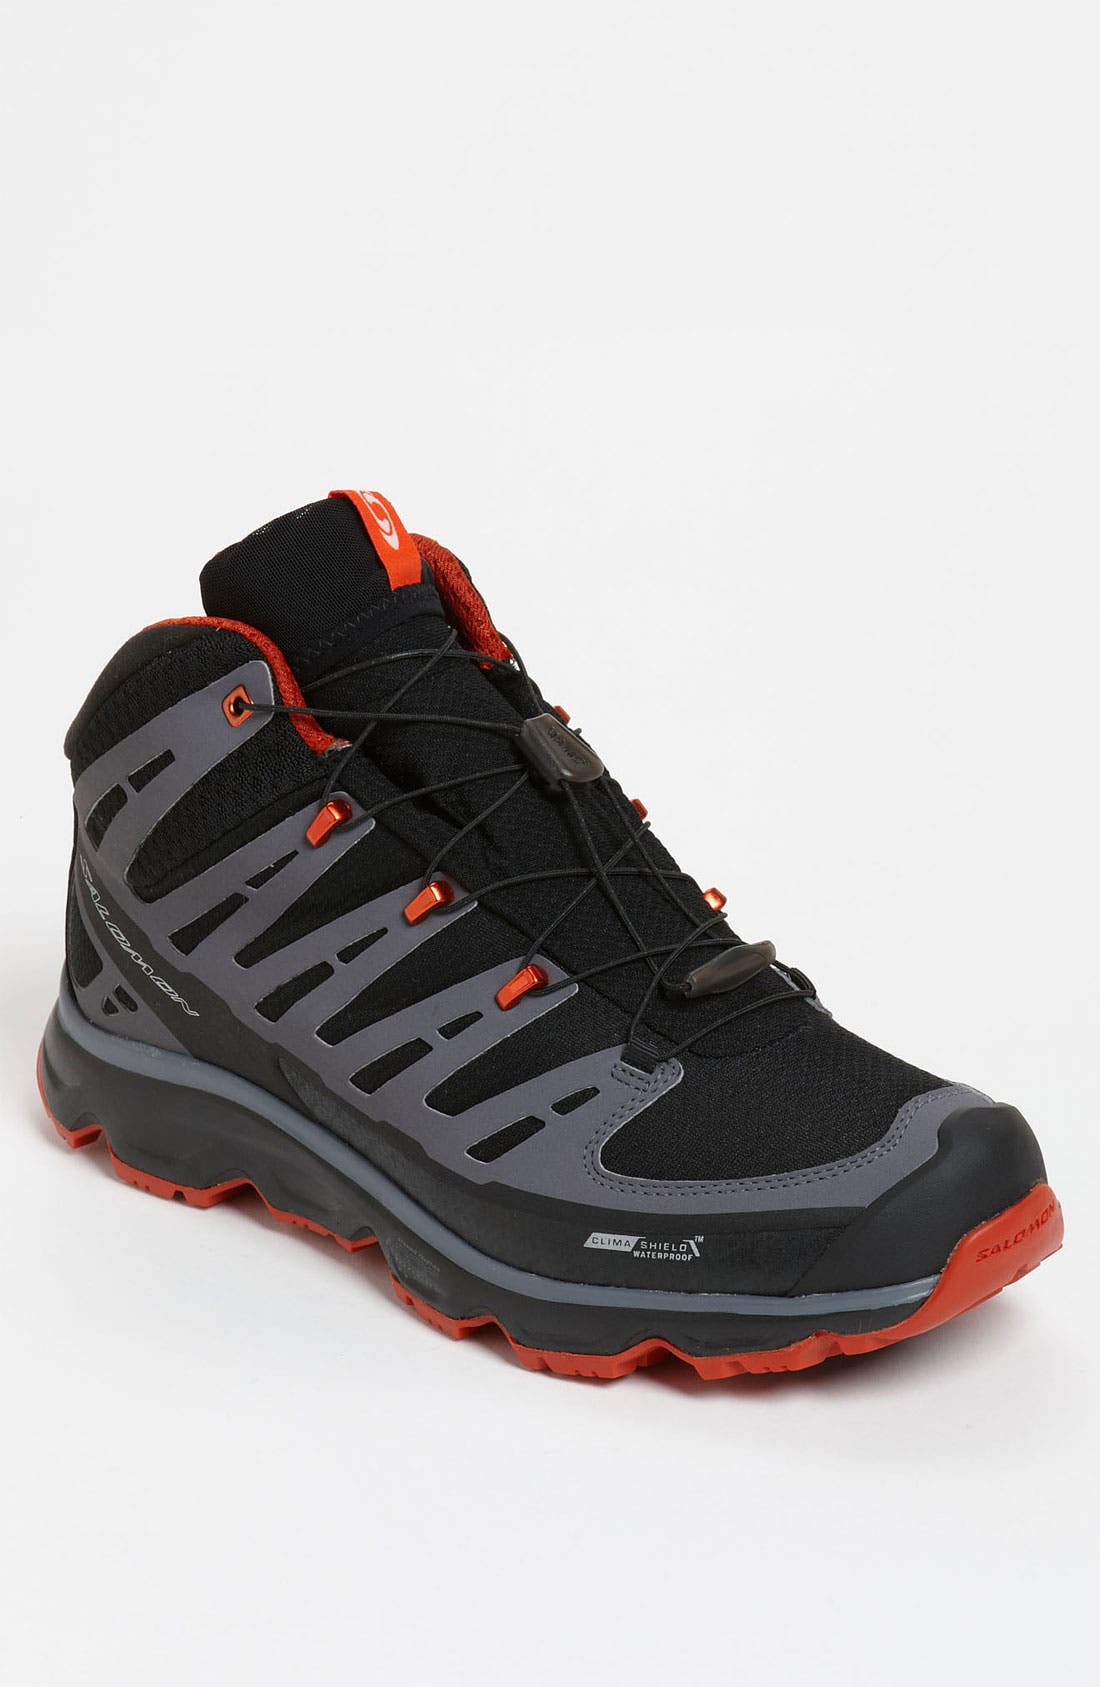 Main Image - Salomon 'Synapse Mid CS' Hiking Shoe (Men) (Online Only)